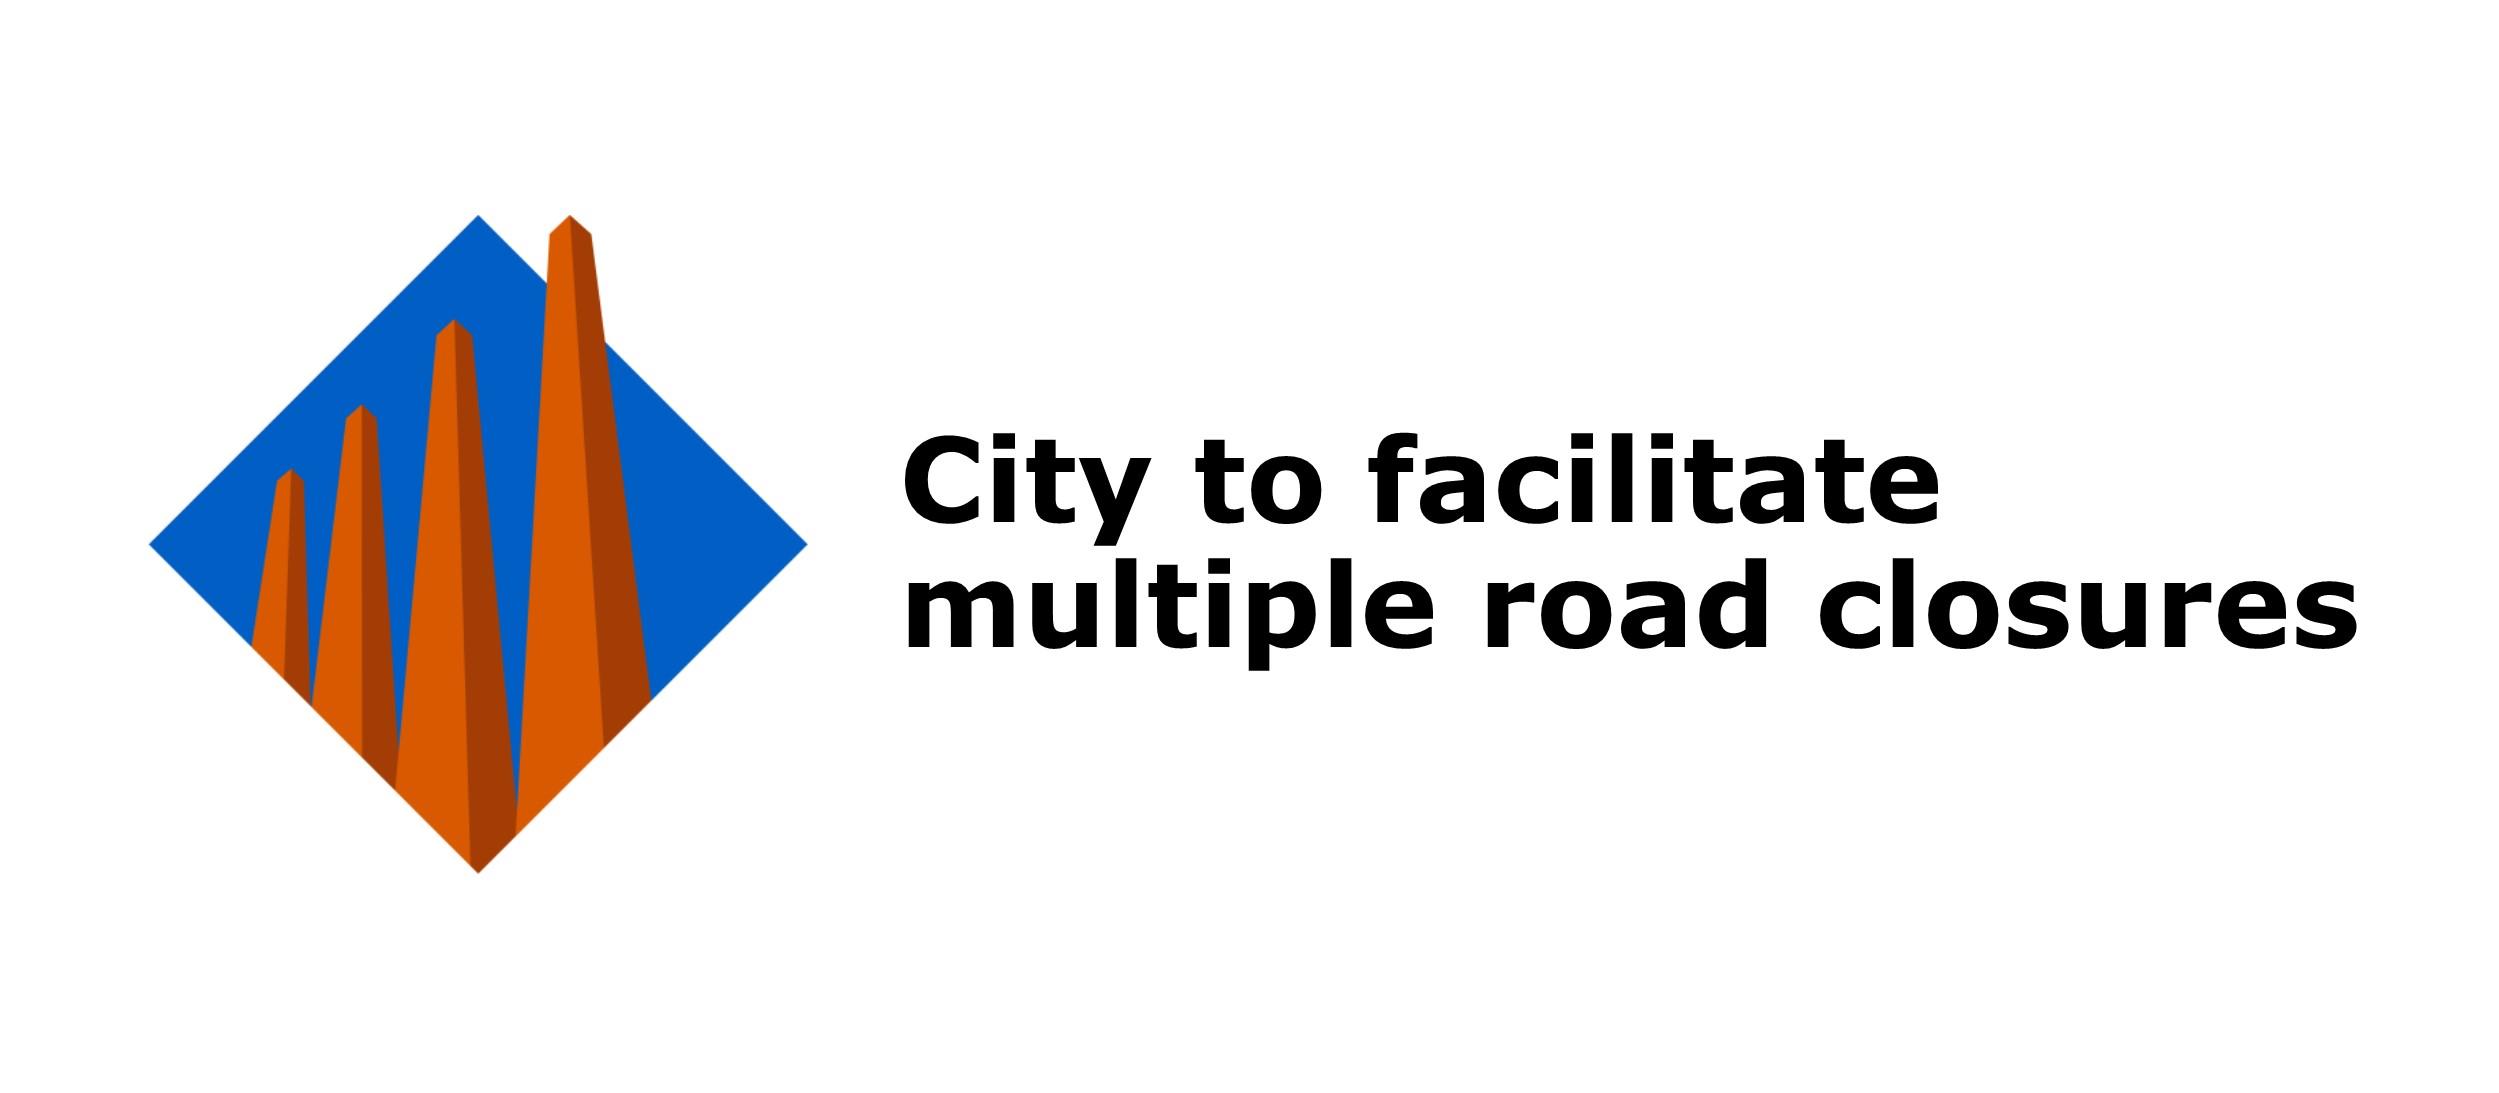 Parade road closures